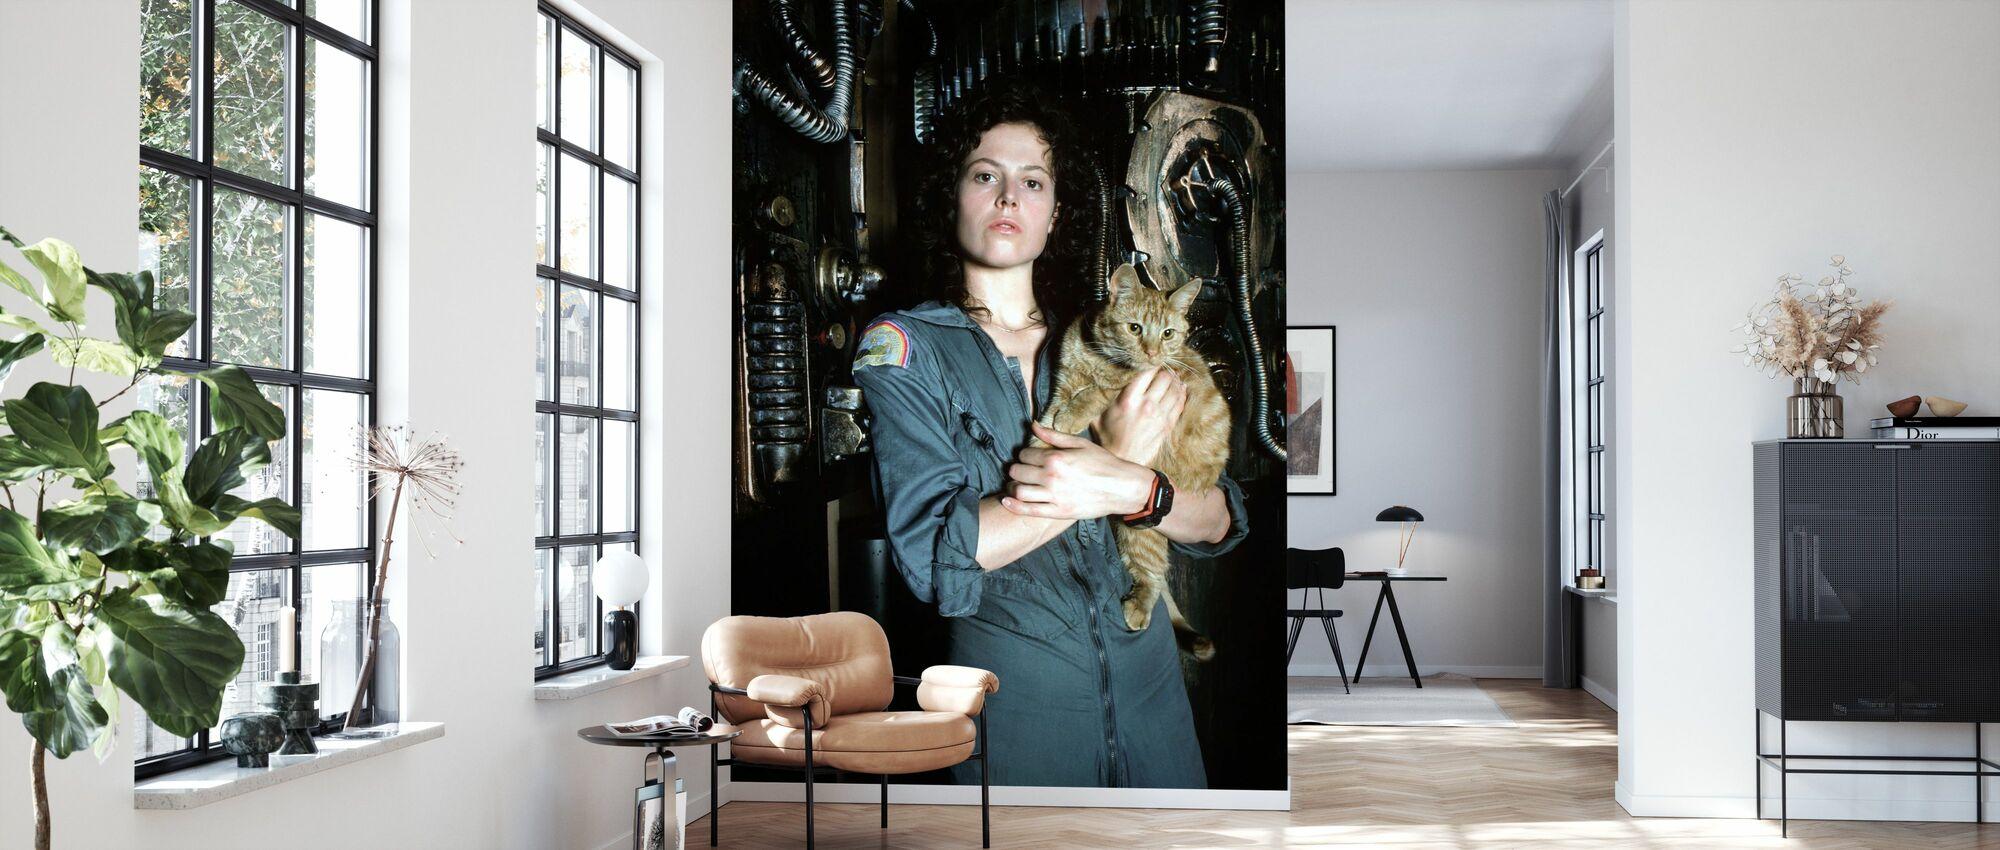 Främmande - Sigourney Weaver - Tapet - Vardagsrum